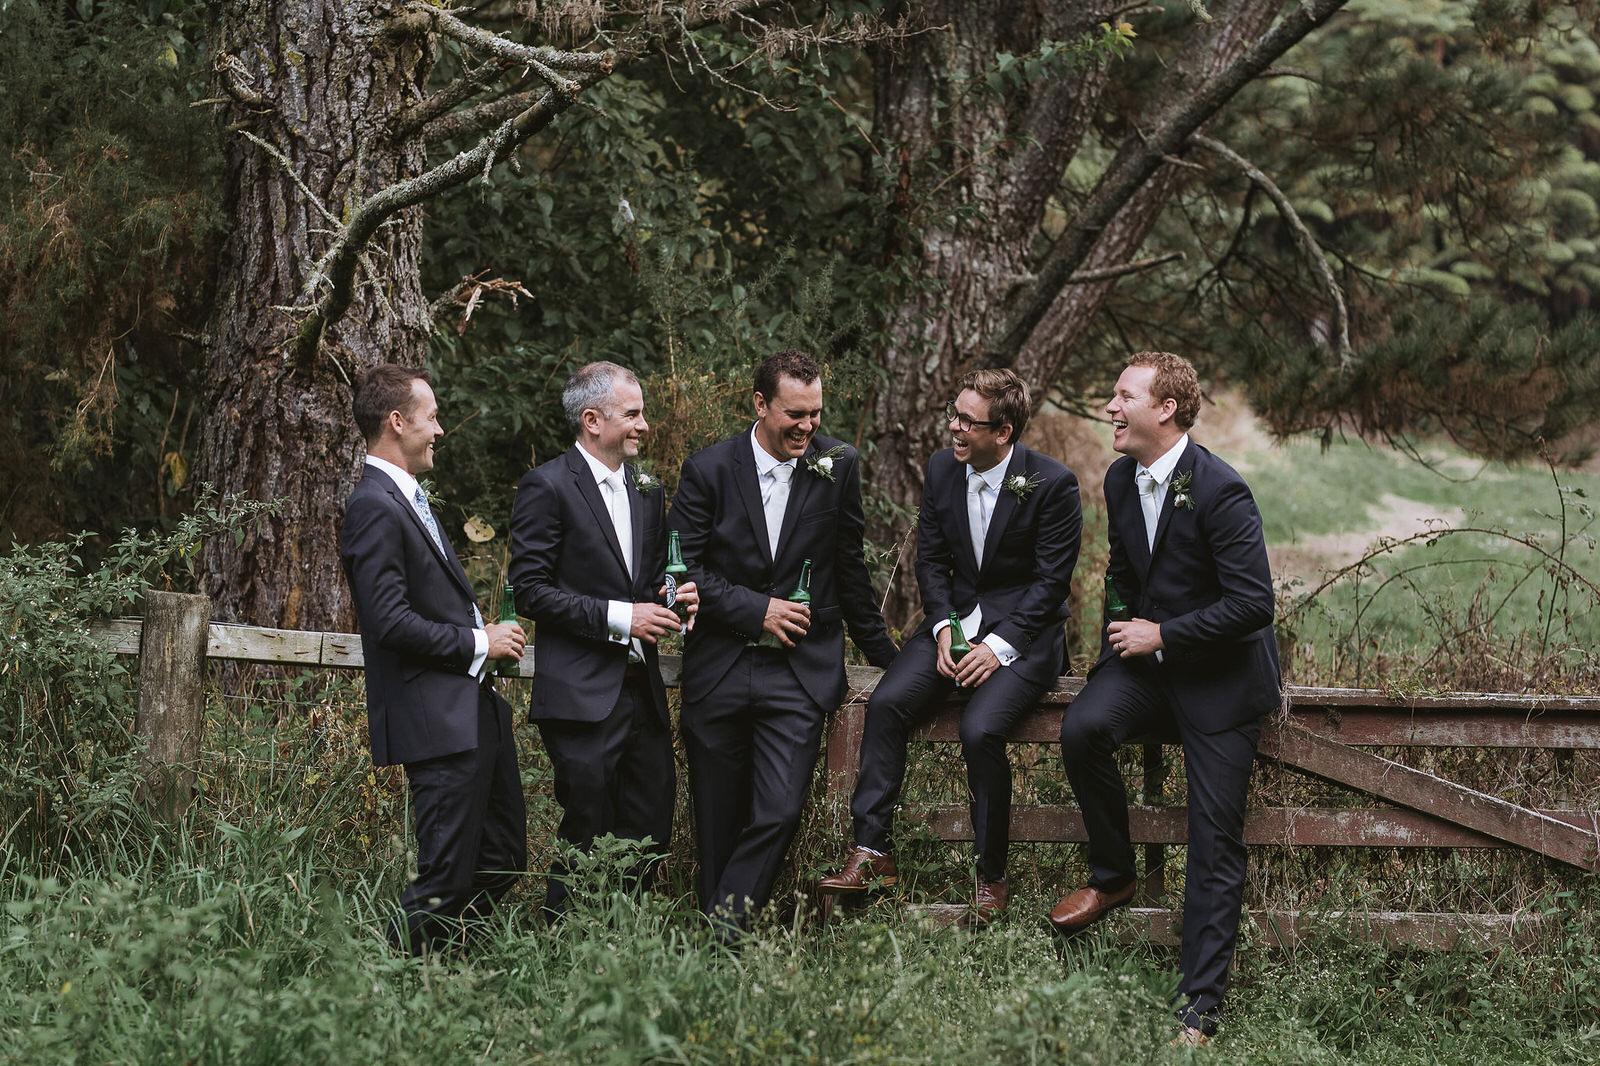 newfound-r-s-ataahua-garden-venue-tauranga-wedding-092